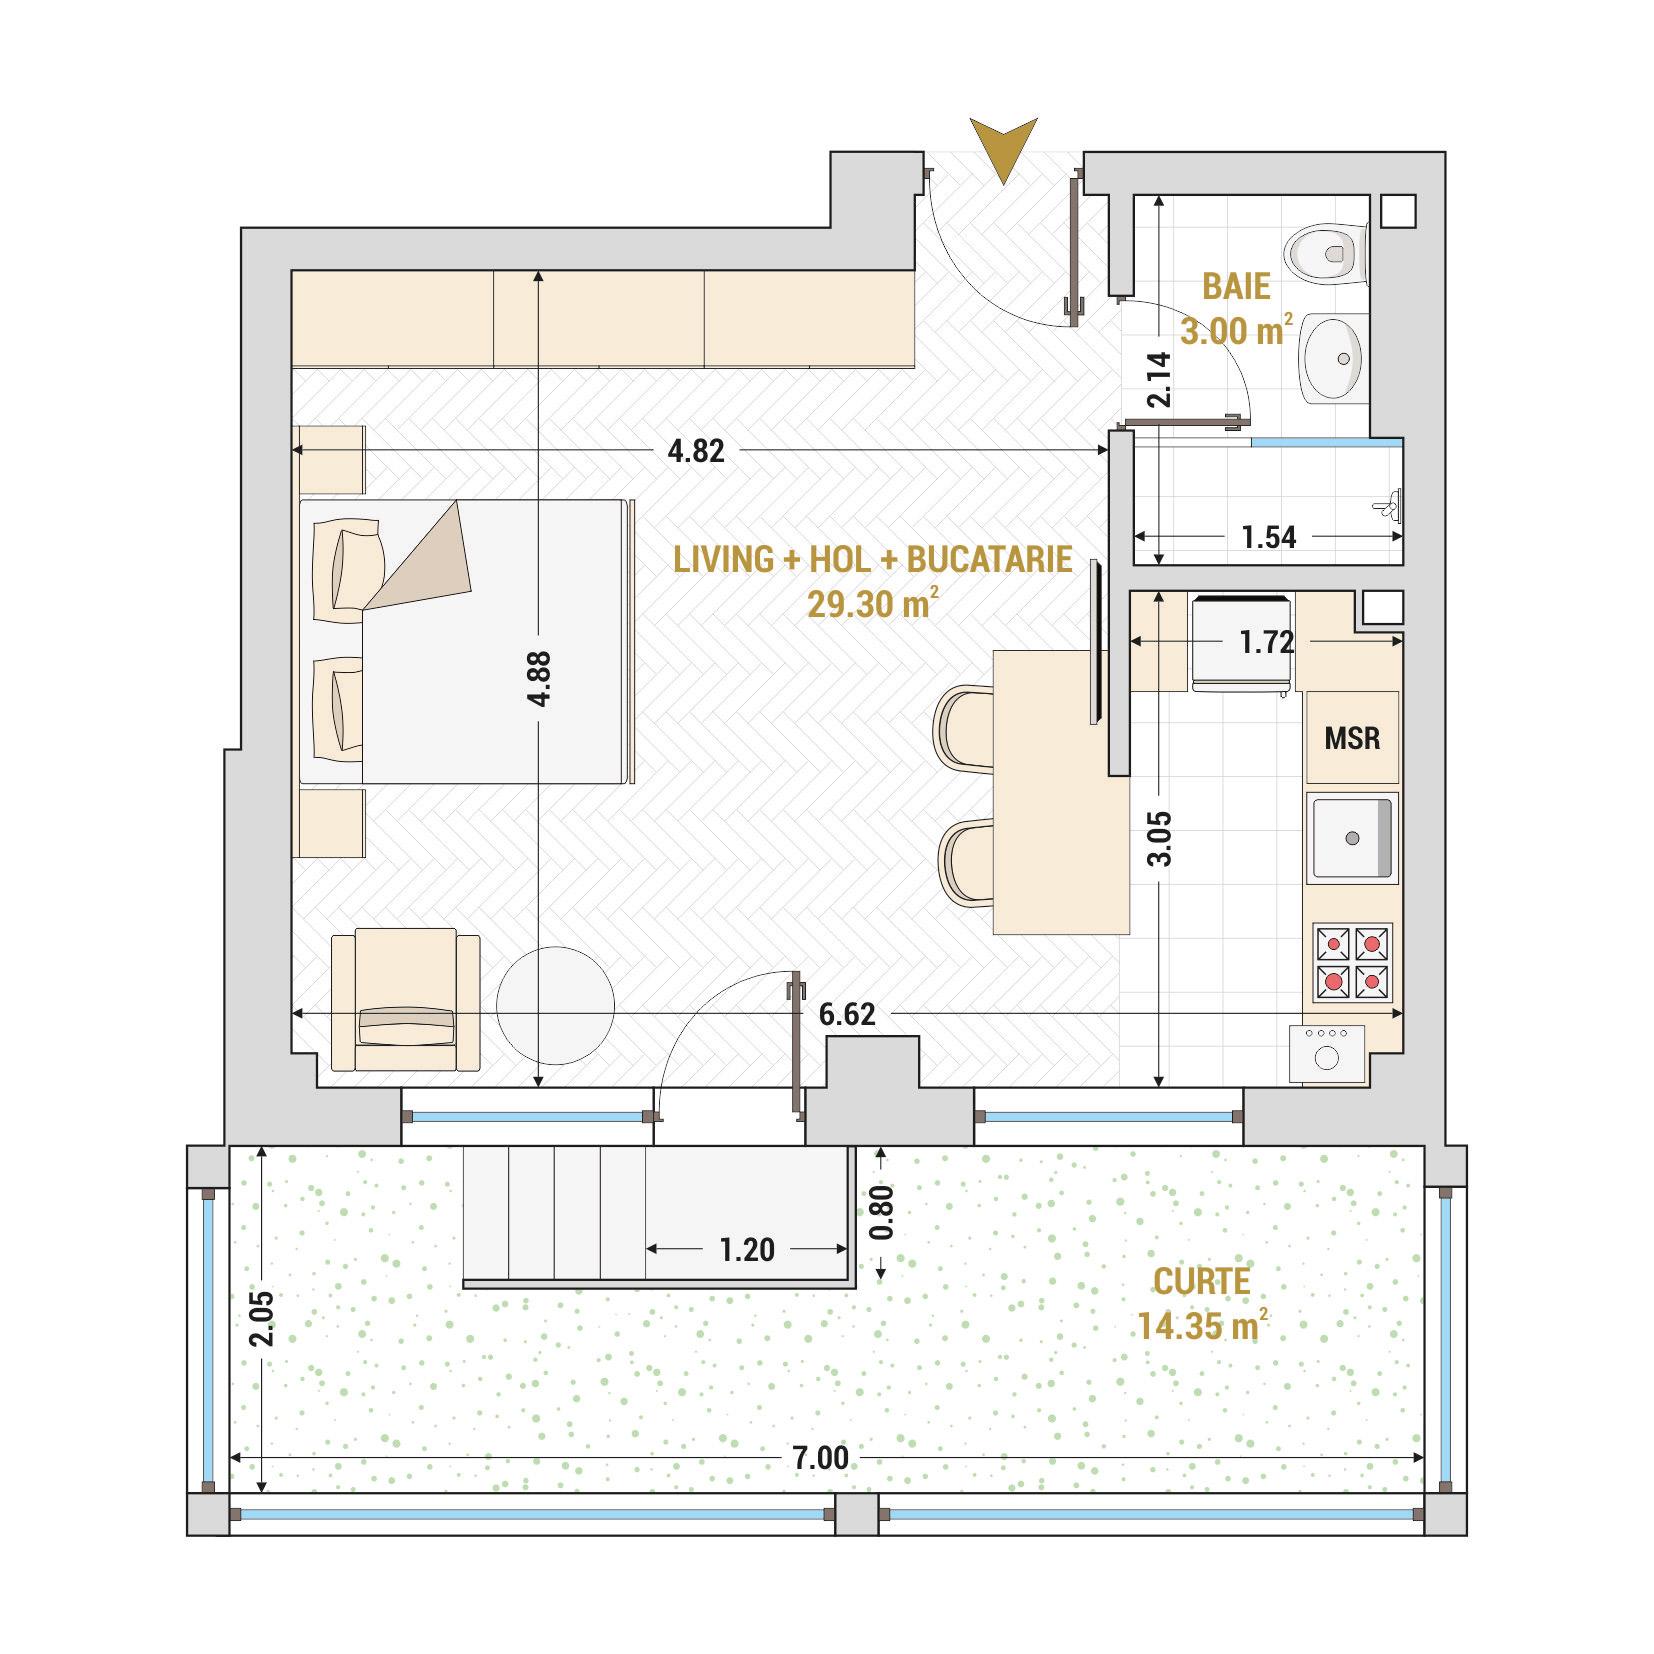 Garsoniere de vanzare Bucuresti - Catedral Residence - Marriott, Piata Unirii, 13 Septembrie, Izvor - Tip 5 - T1A